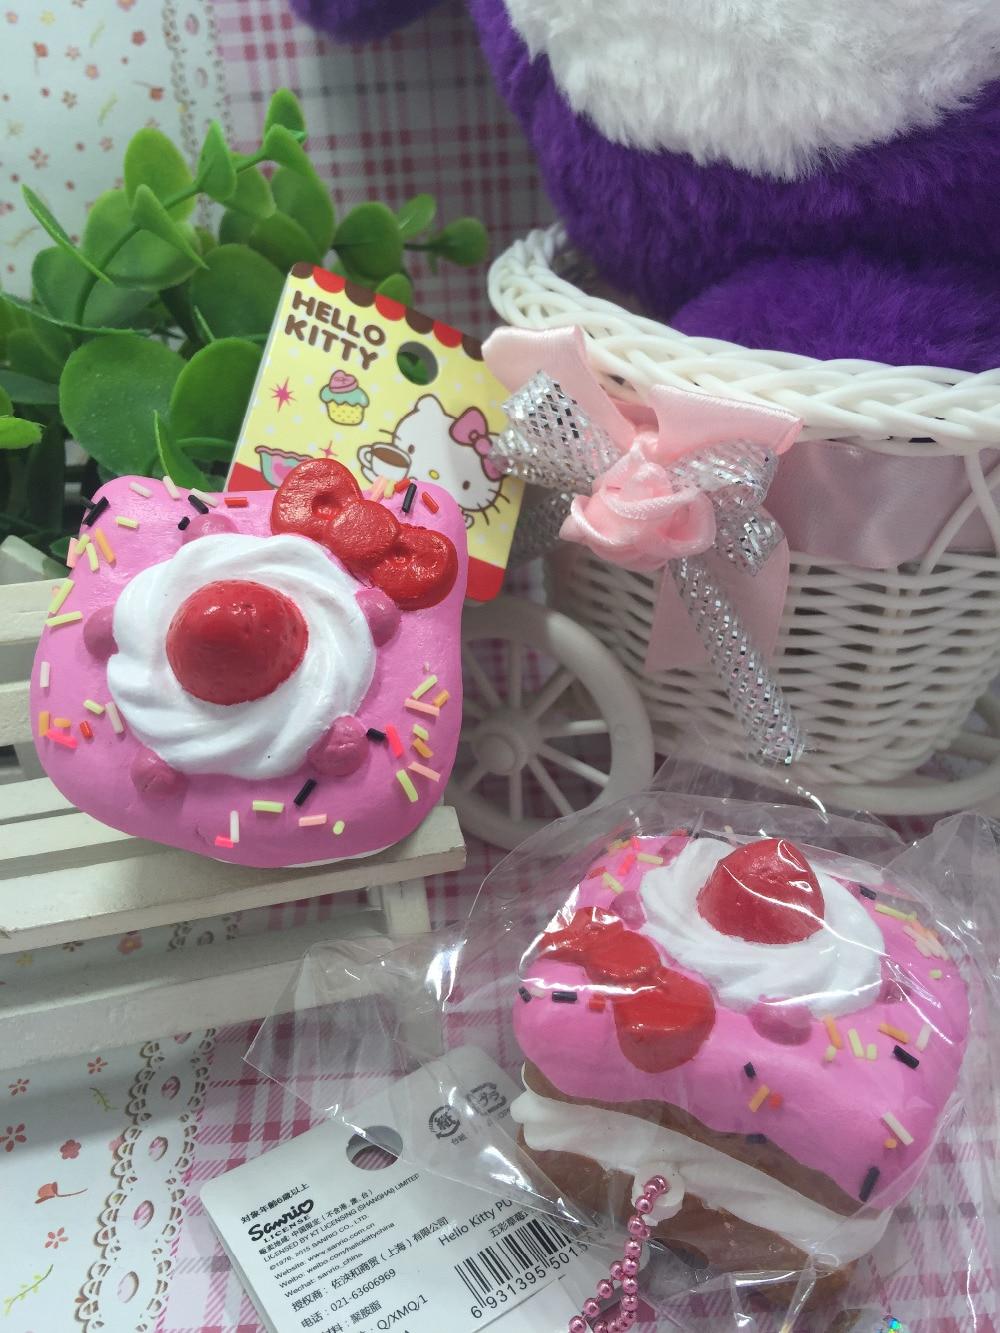 1PC Pachet original Rare Hello Kitty Tort dulce Squishy Squishy Telefon Farmecul Roz Jucarii alimentare Stres eliberare Jucarii Curea Squishies